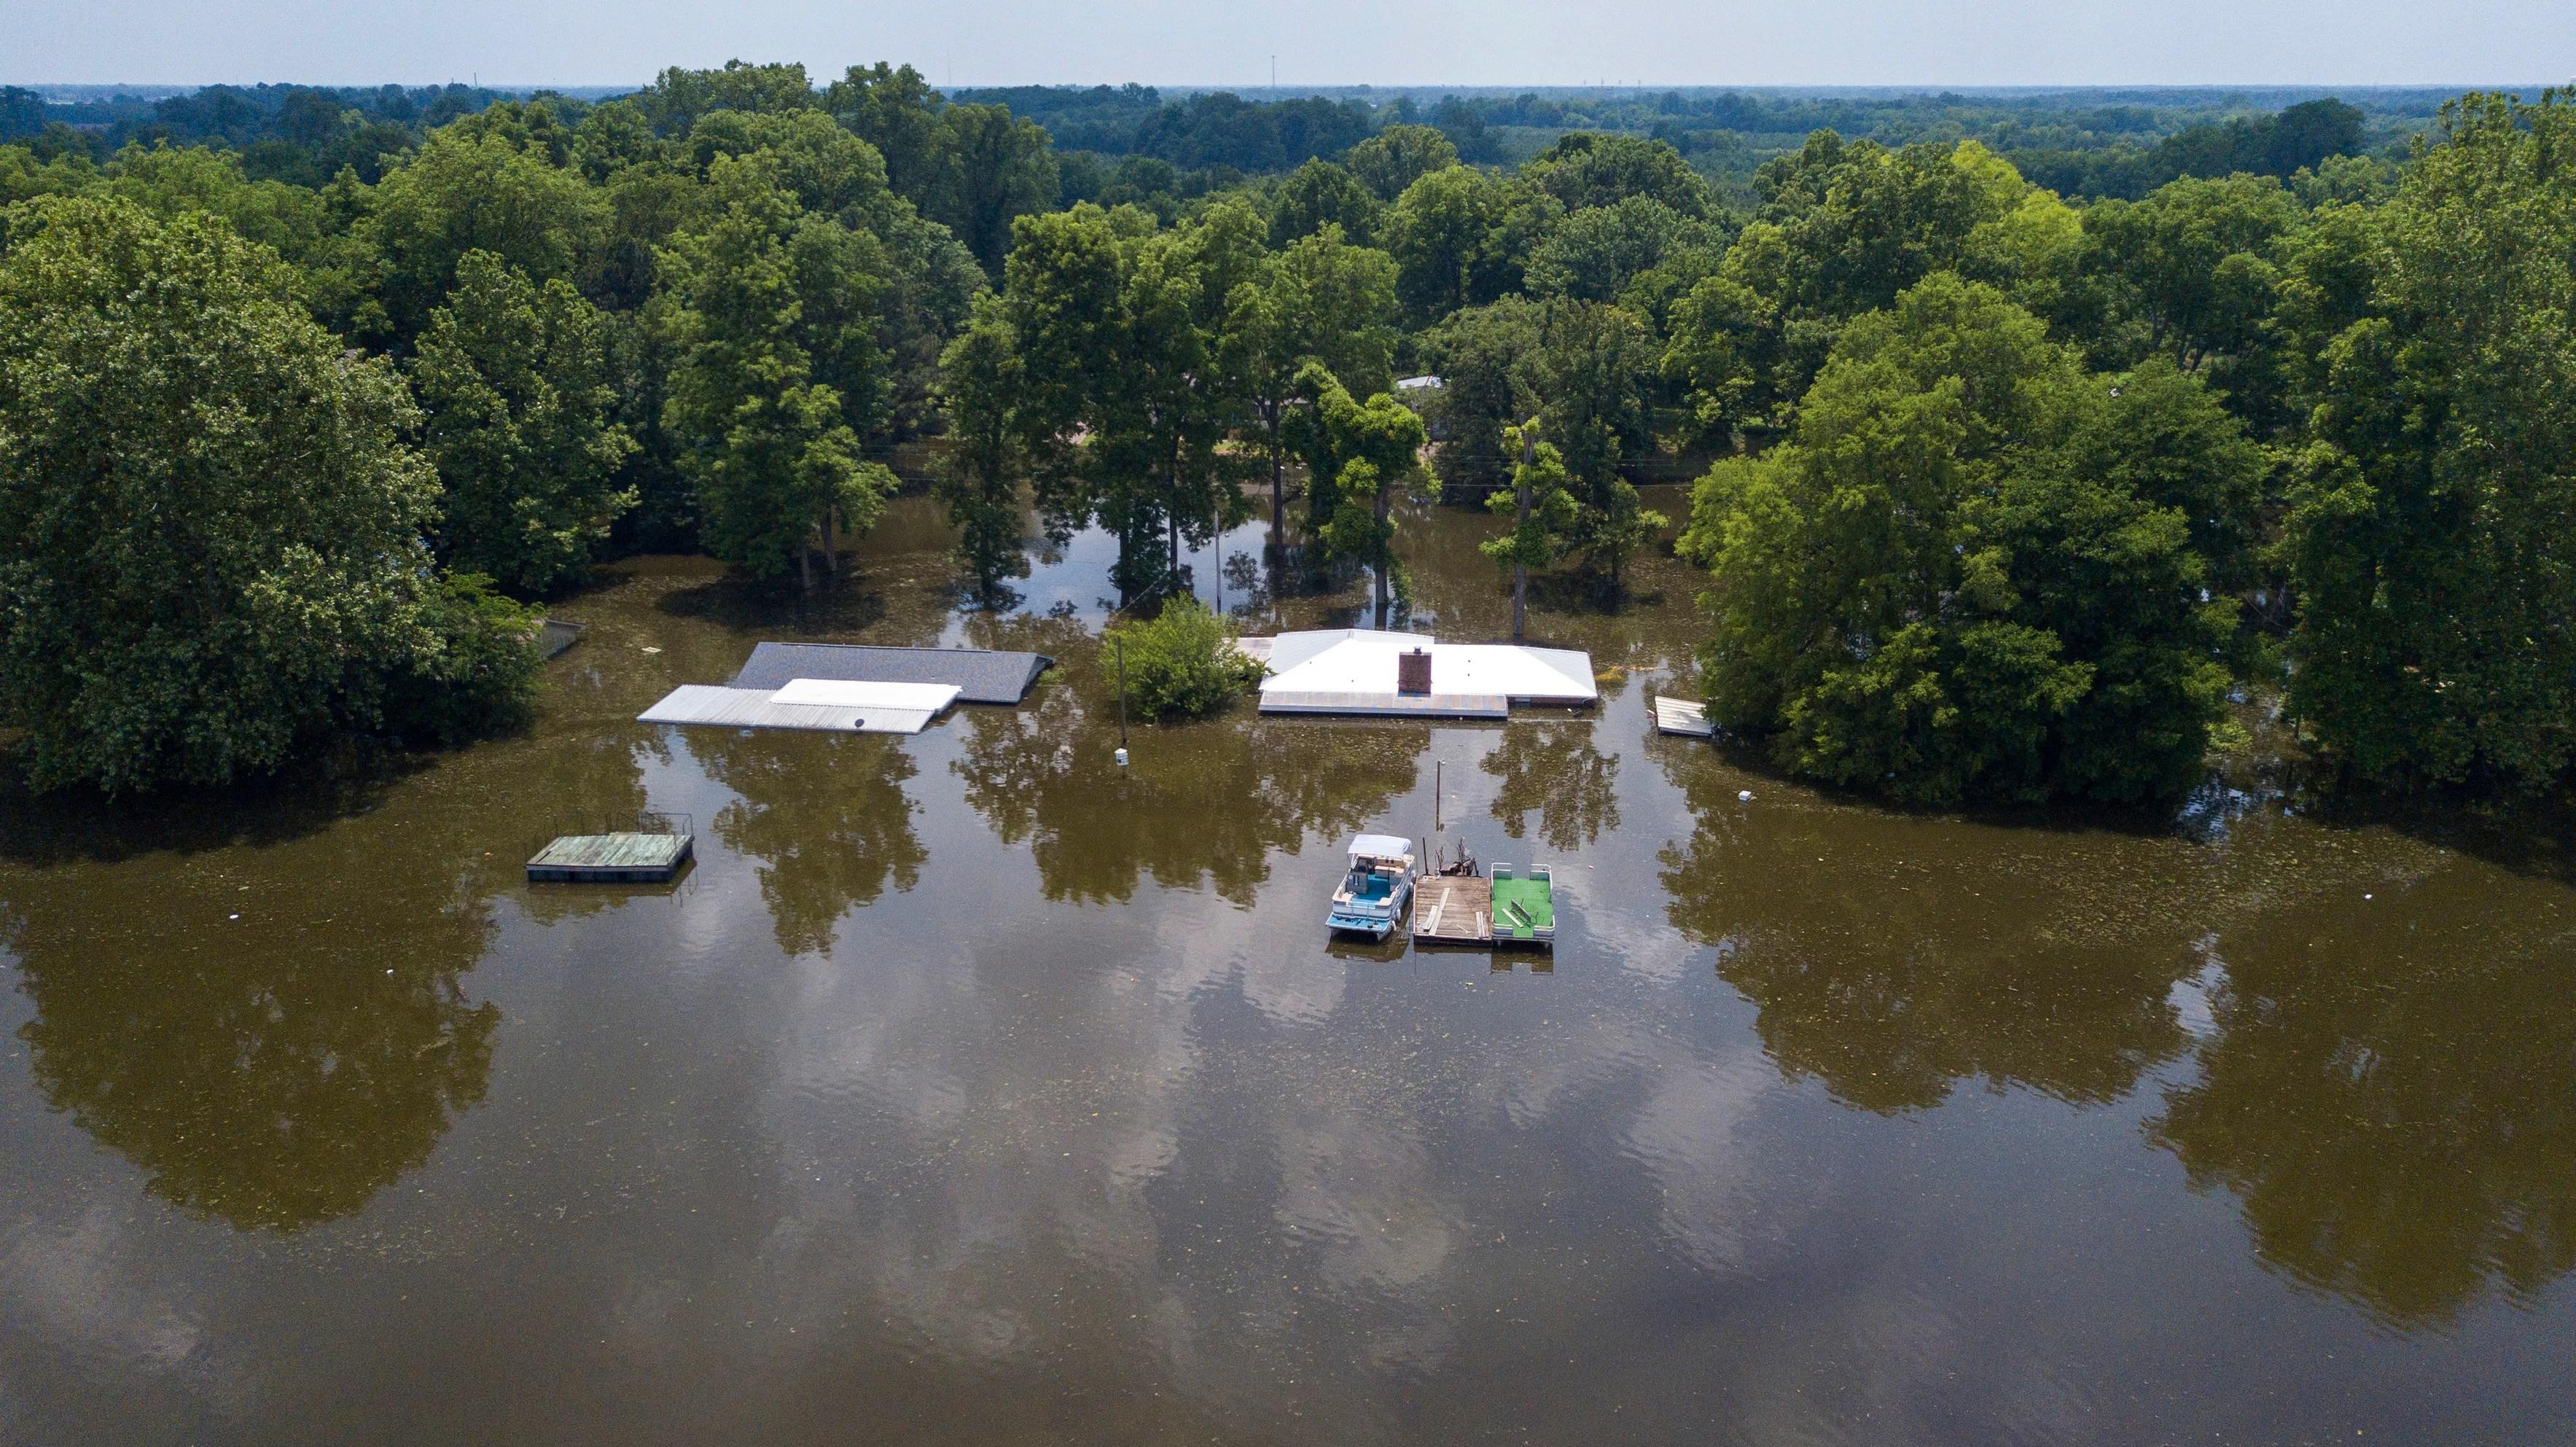 Pine Bluff Officials Flood Won T Sink Arkansas City S Hopes The Seattle Times